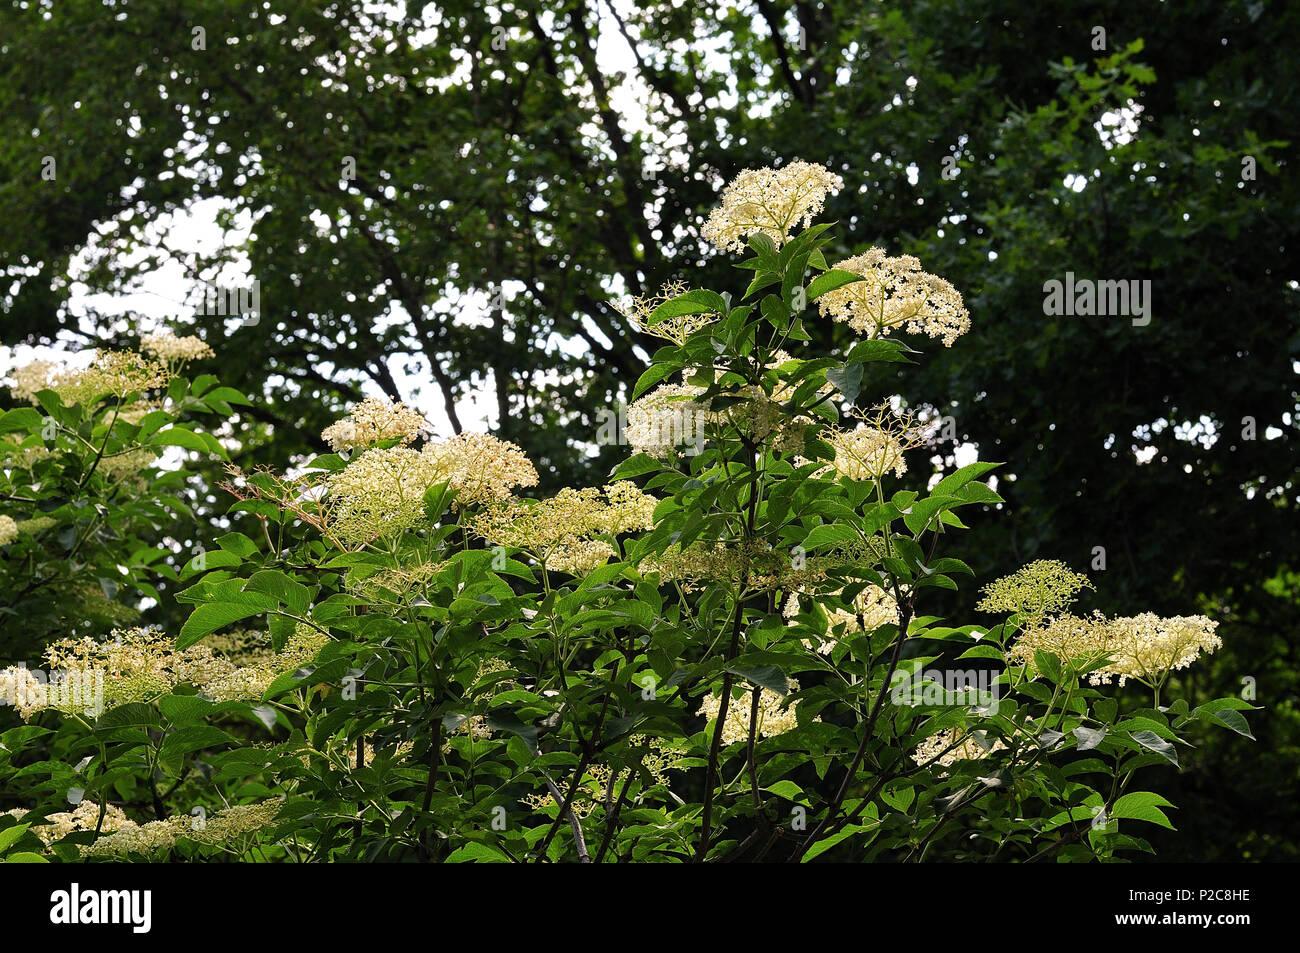 White Flower Cluster Of A Blooming Elder Bush Stock Photo 208023914